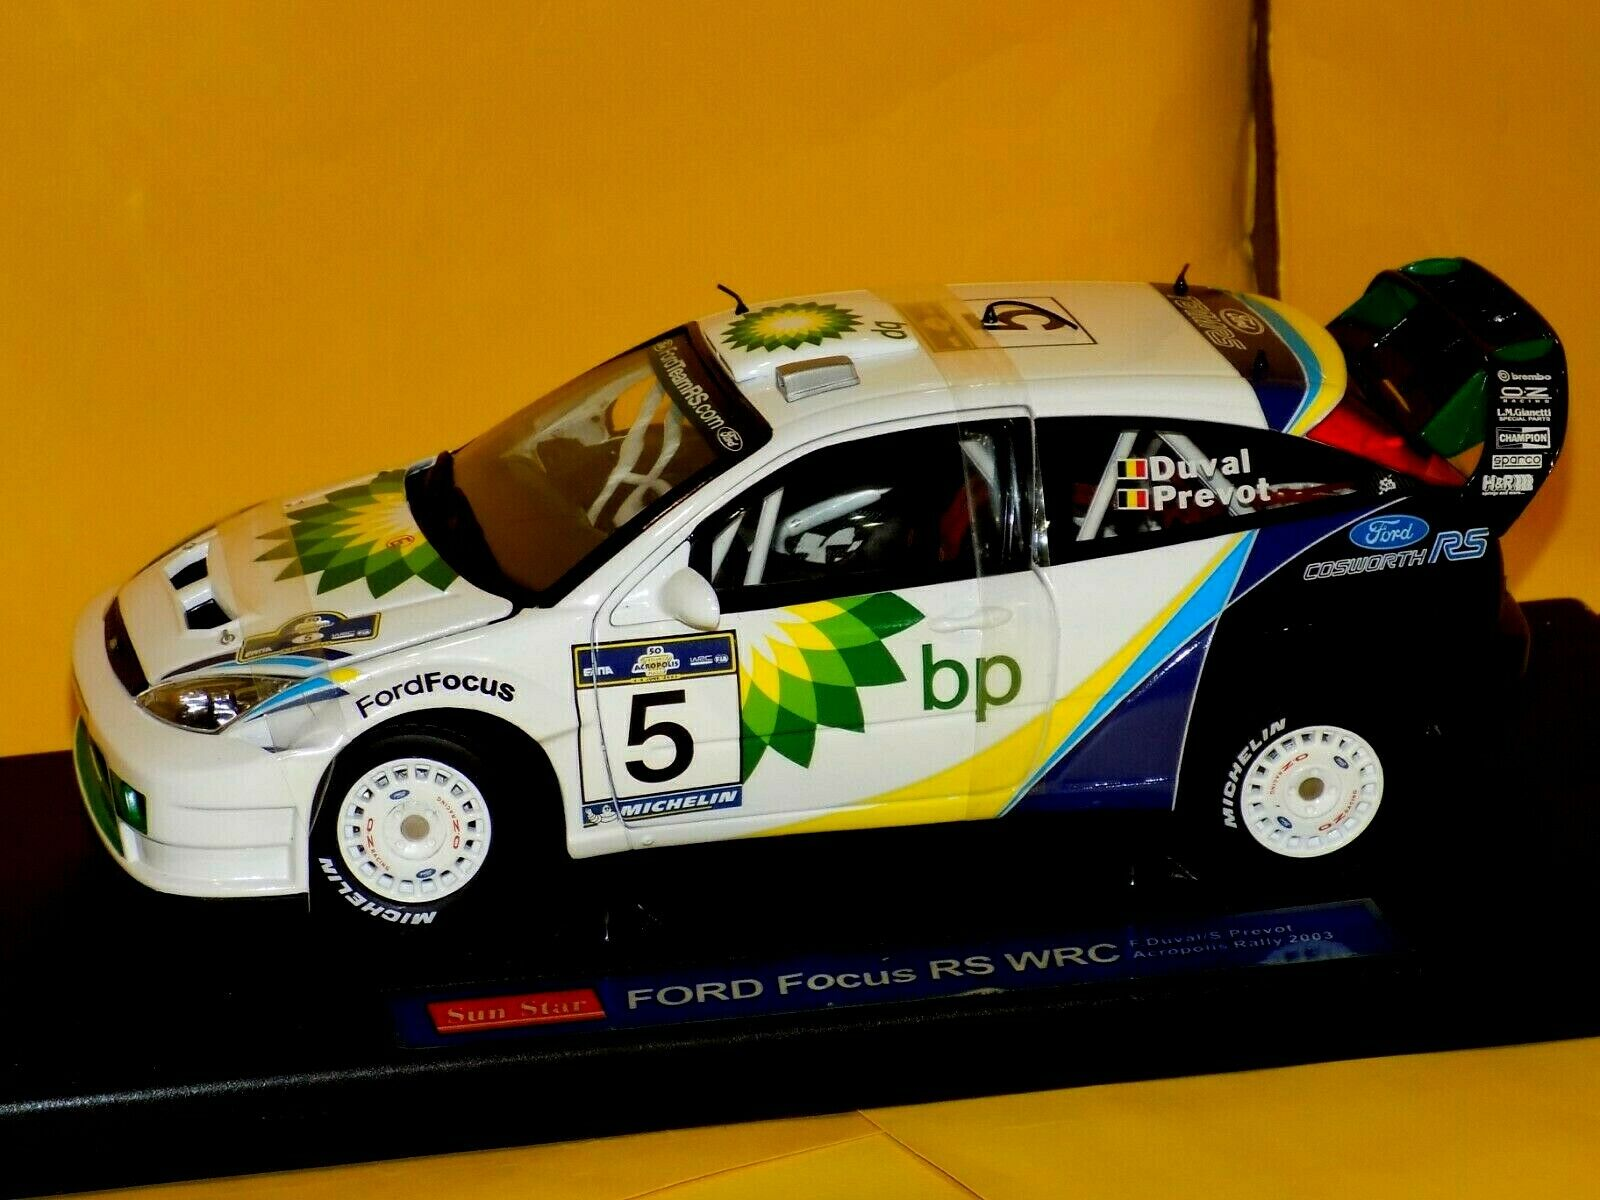 Ford Focus RS WRC  5  Acropolis 2003 Duval Prevot  Sunstar 3902 1 18